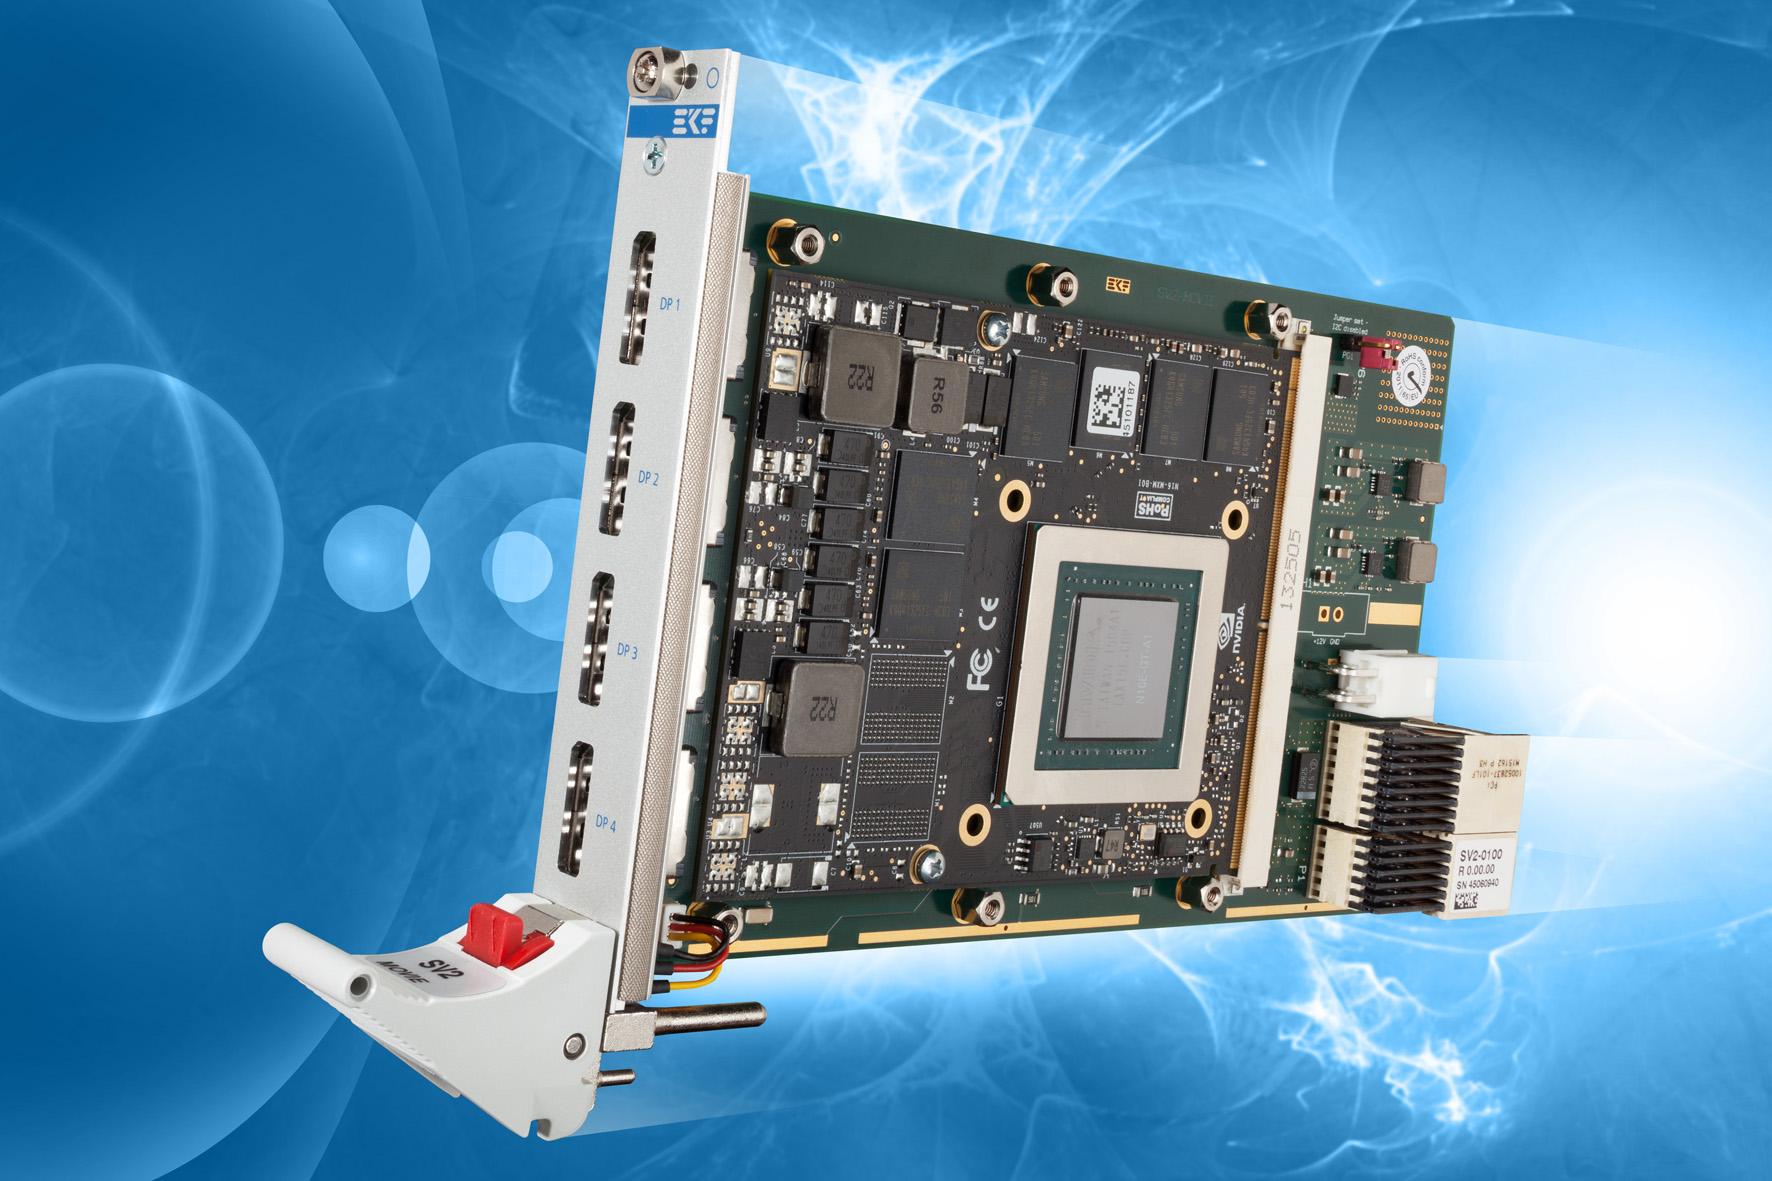 Ekf Compactpci 174 Serial Products Sv2 Movie Mxm 3 0 3 1